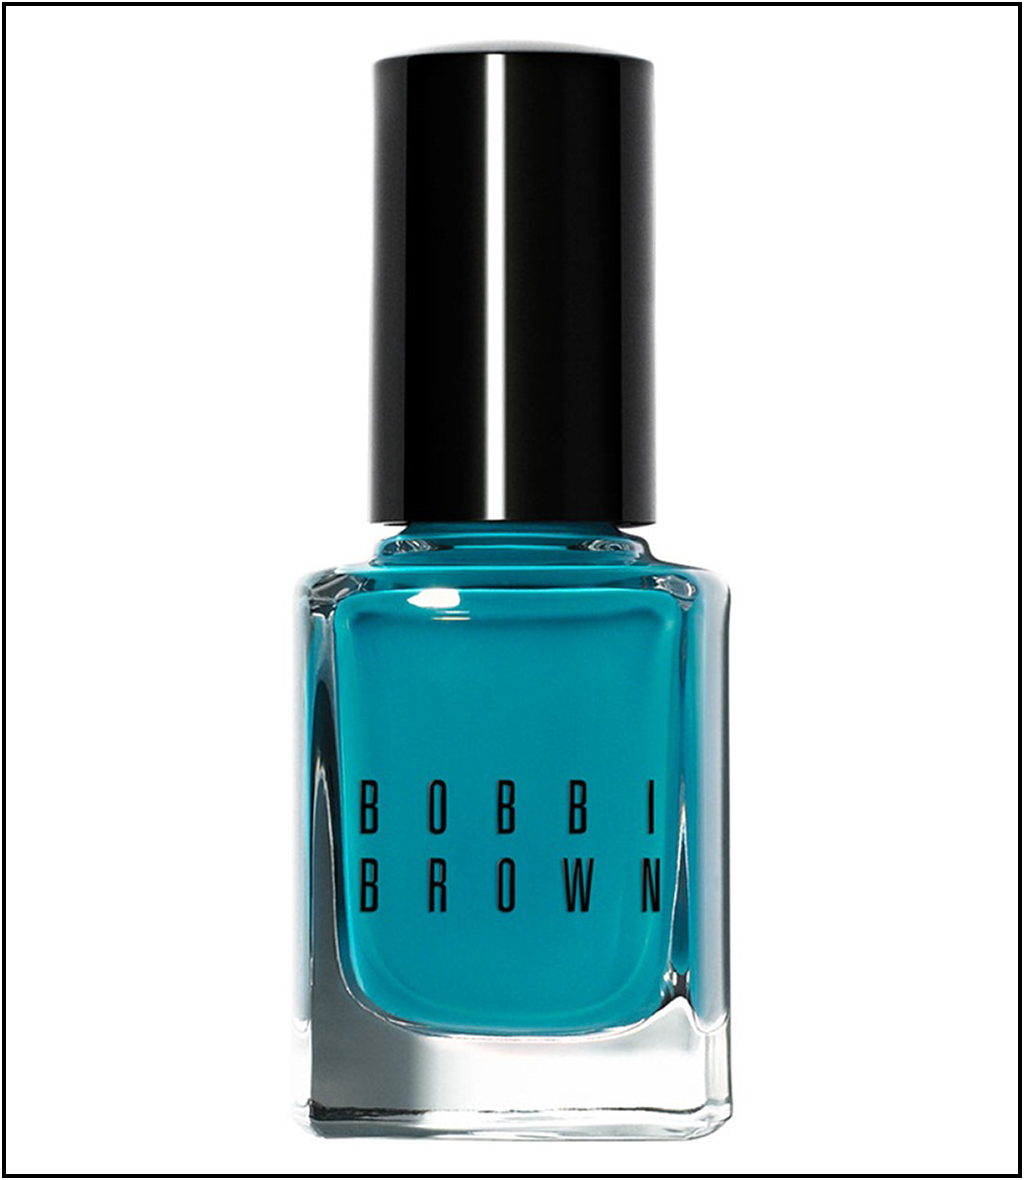 http://1.bp.blogspot.com/-MwrLsdDQlU4/T9-vF_hVIyI/AAAAAAAAXWU/UdxLszrnbRI/s1600/Bobbi-Brown-Desert-Twilight-Nail-Polish.jpg